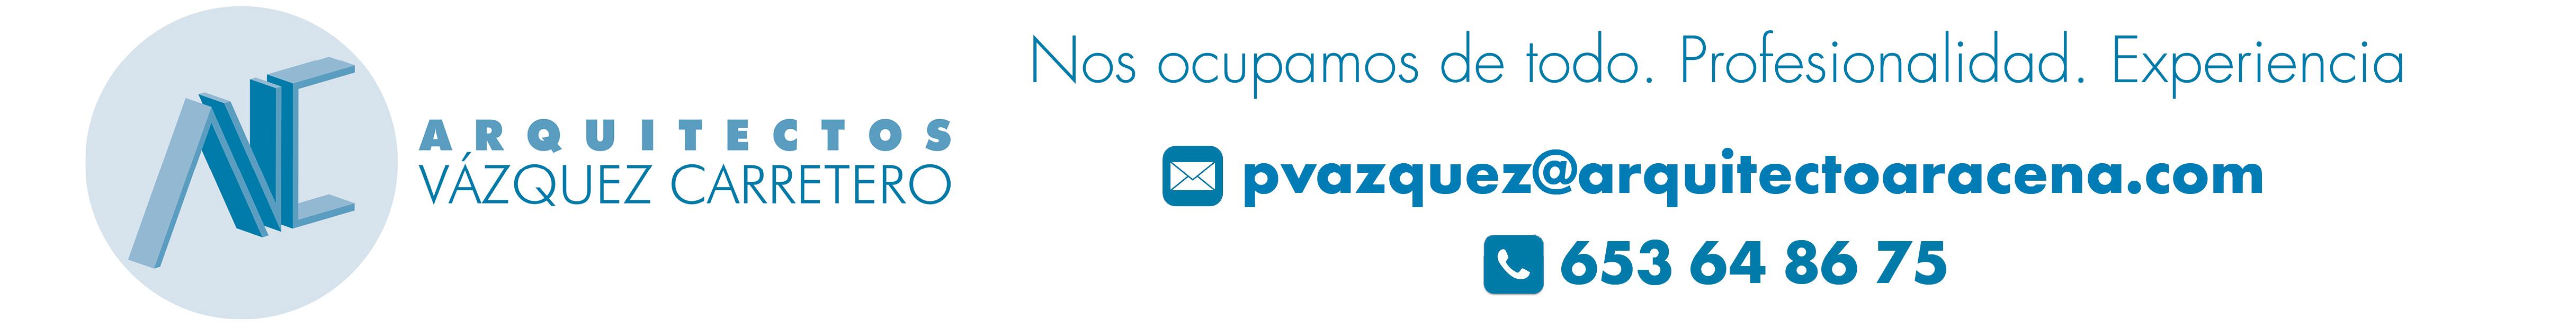 Vázquez Carretero Arquitectos Aracena